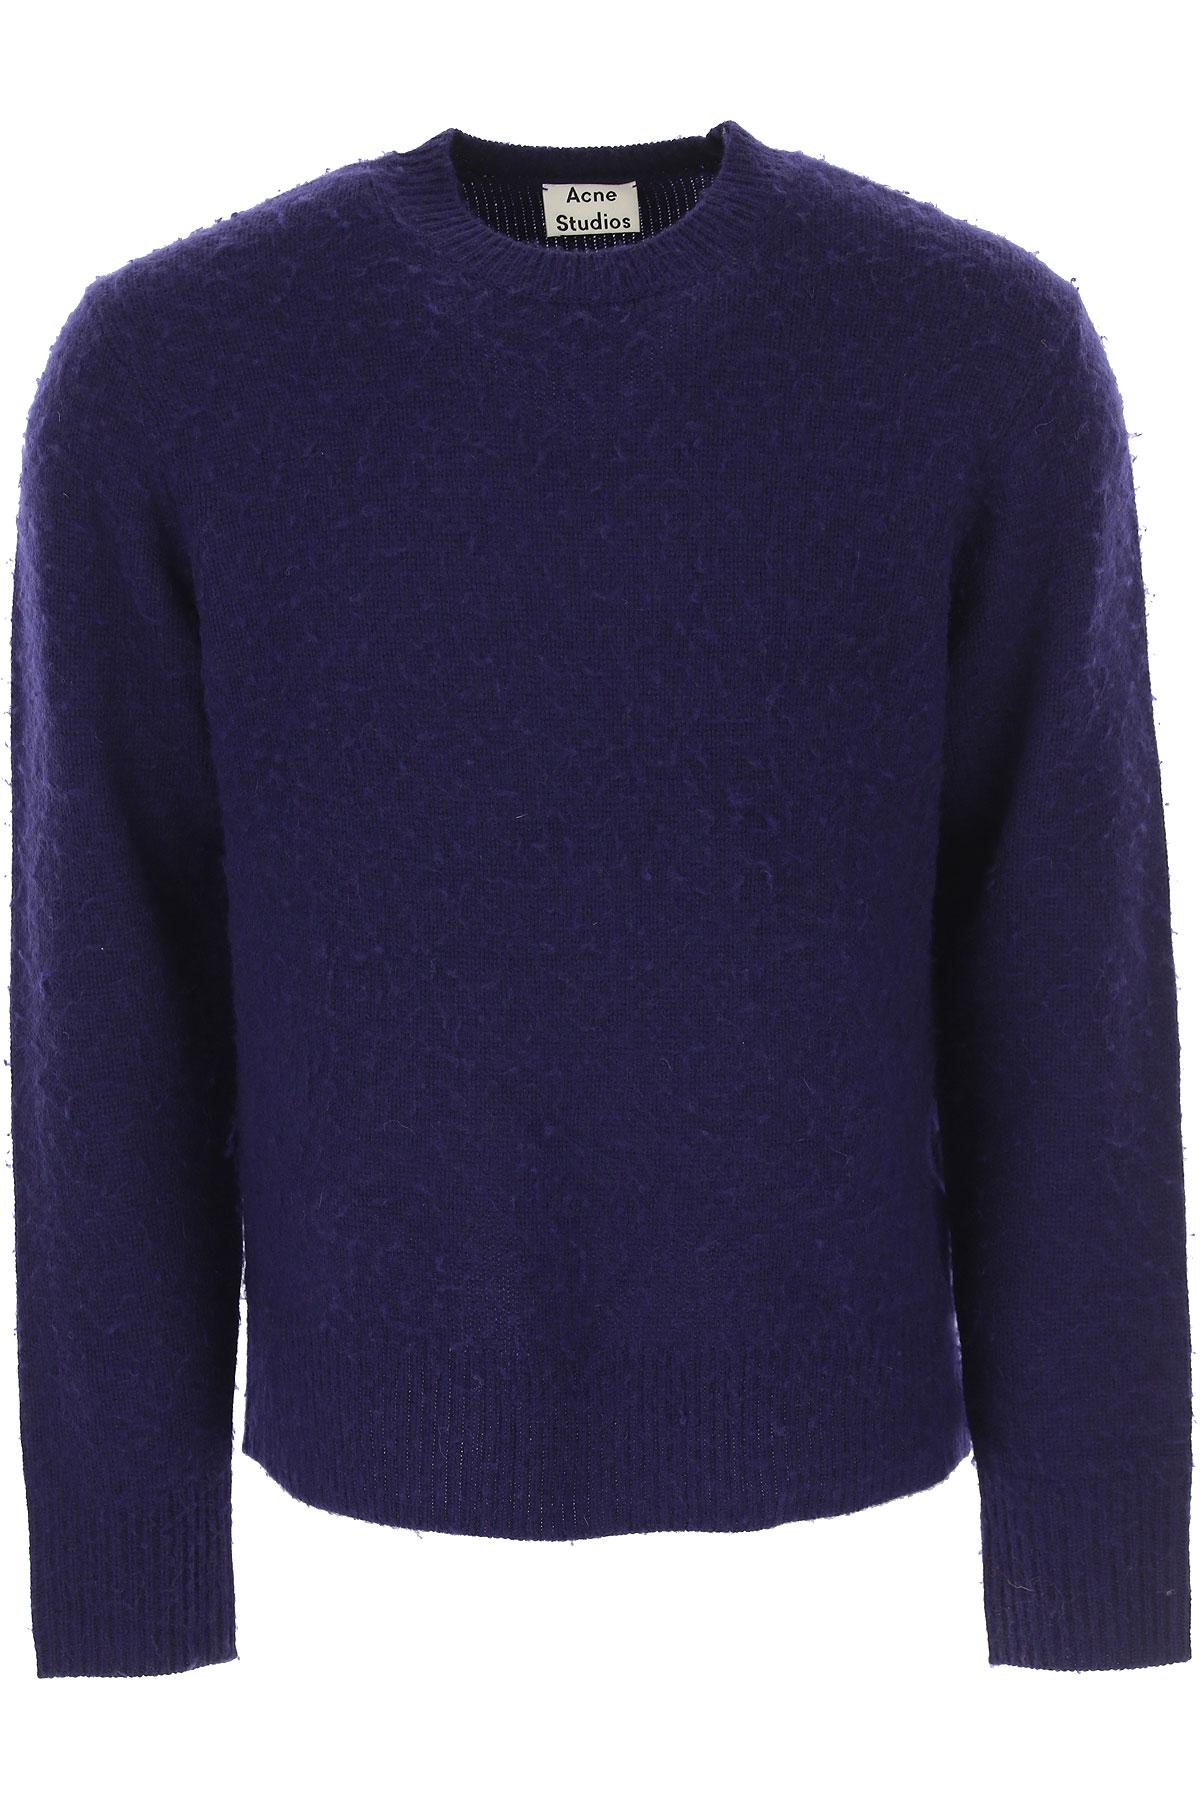 Image of Acne Studios Sweater for Men Jumper, Indigo, Wool, 2017, L M S